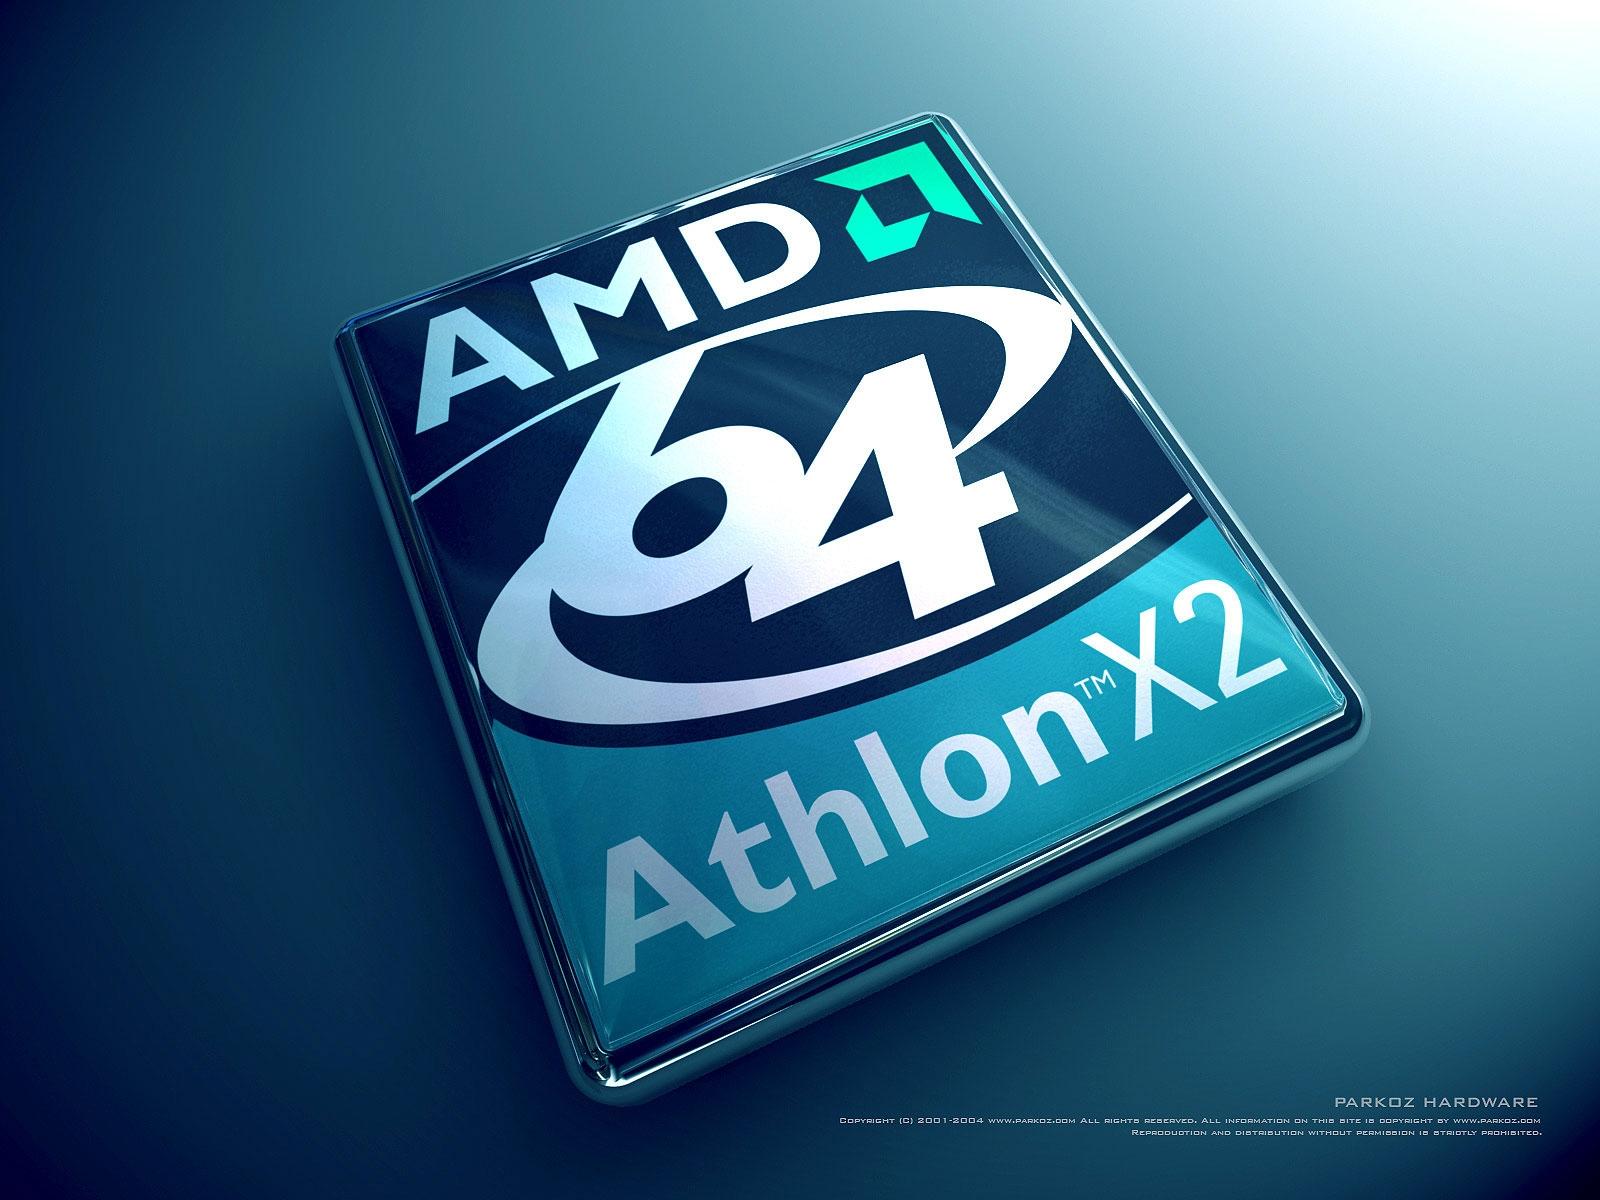 Teknologi - AMD  Athlon X2 Bakgrund